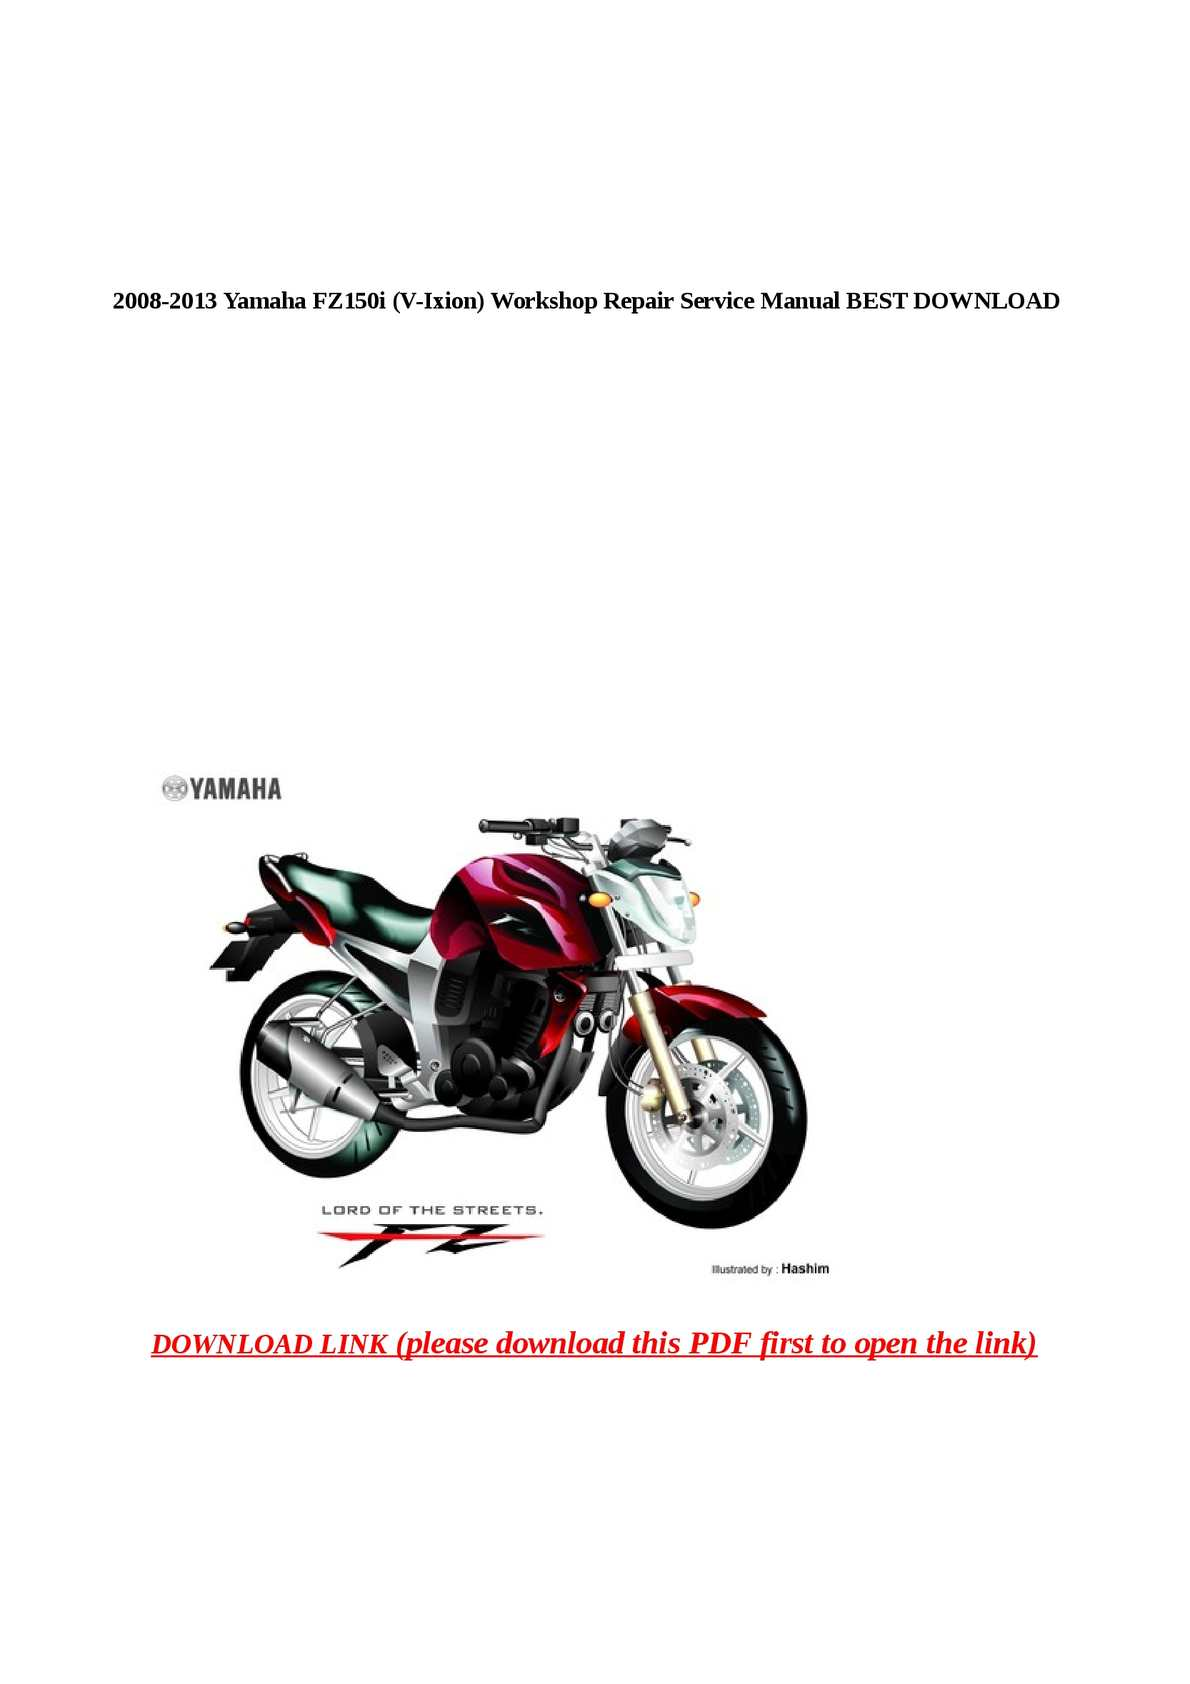 FZ150I SERVICE MANUAL PDF